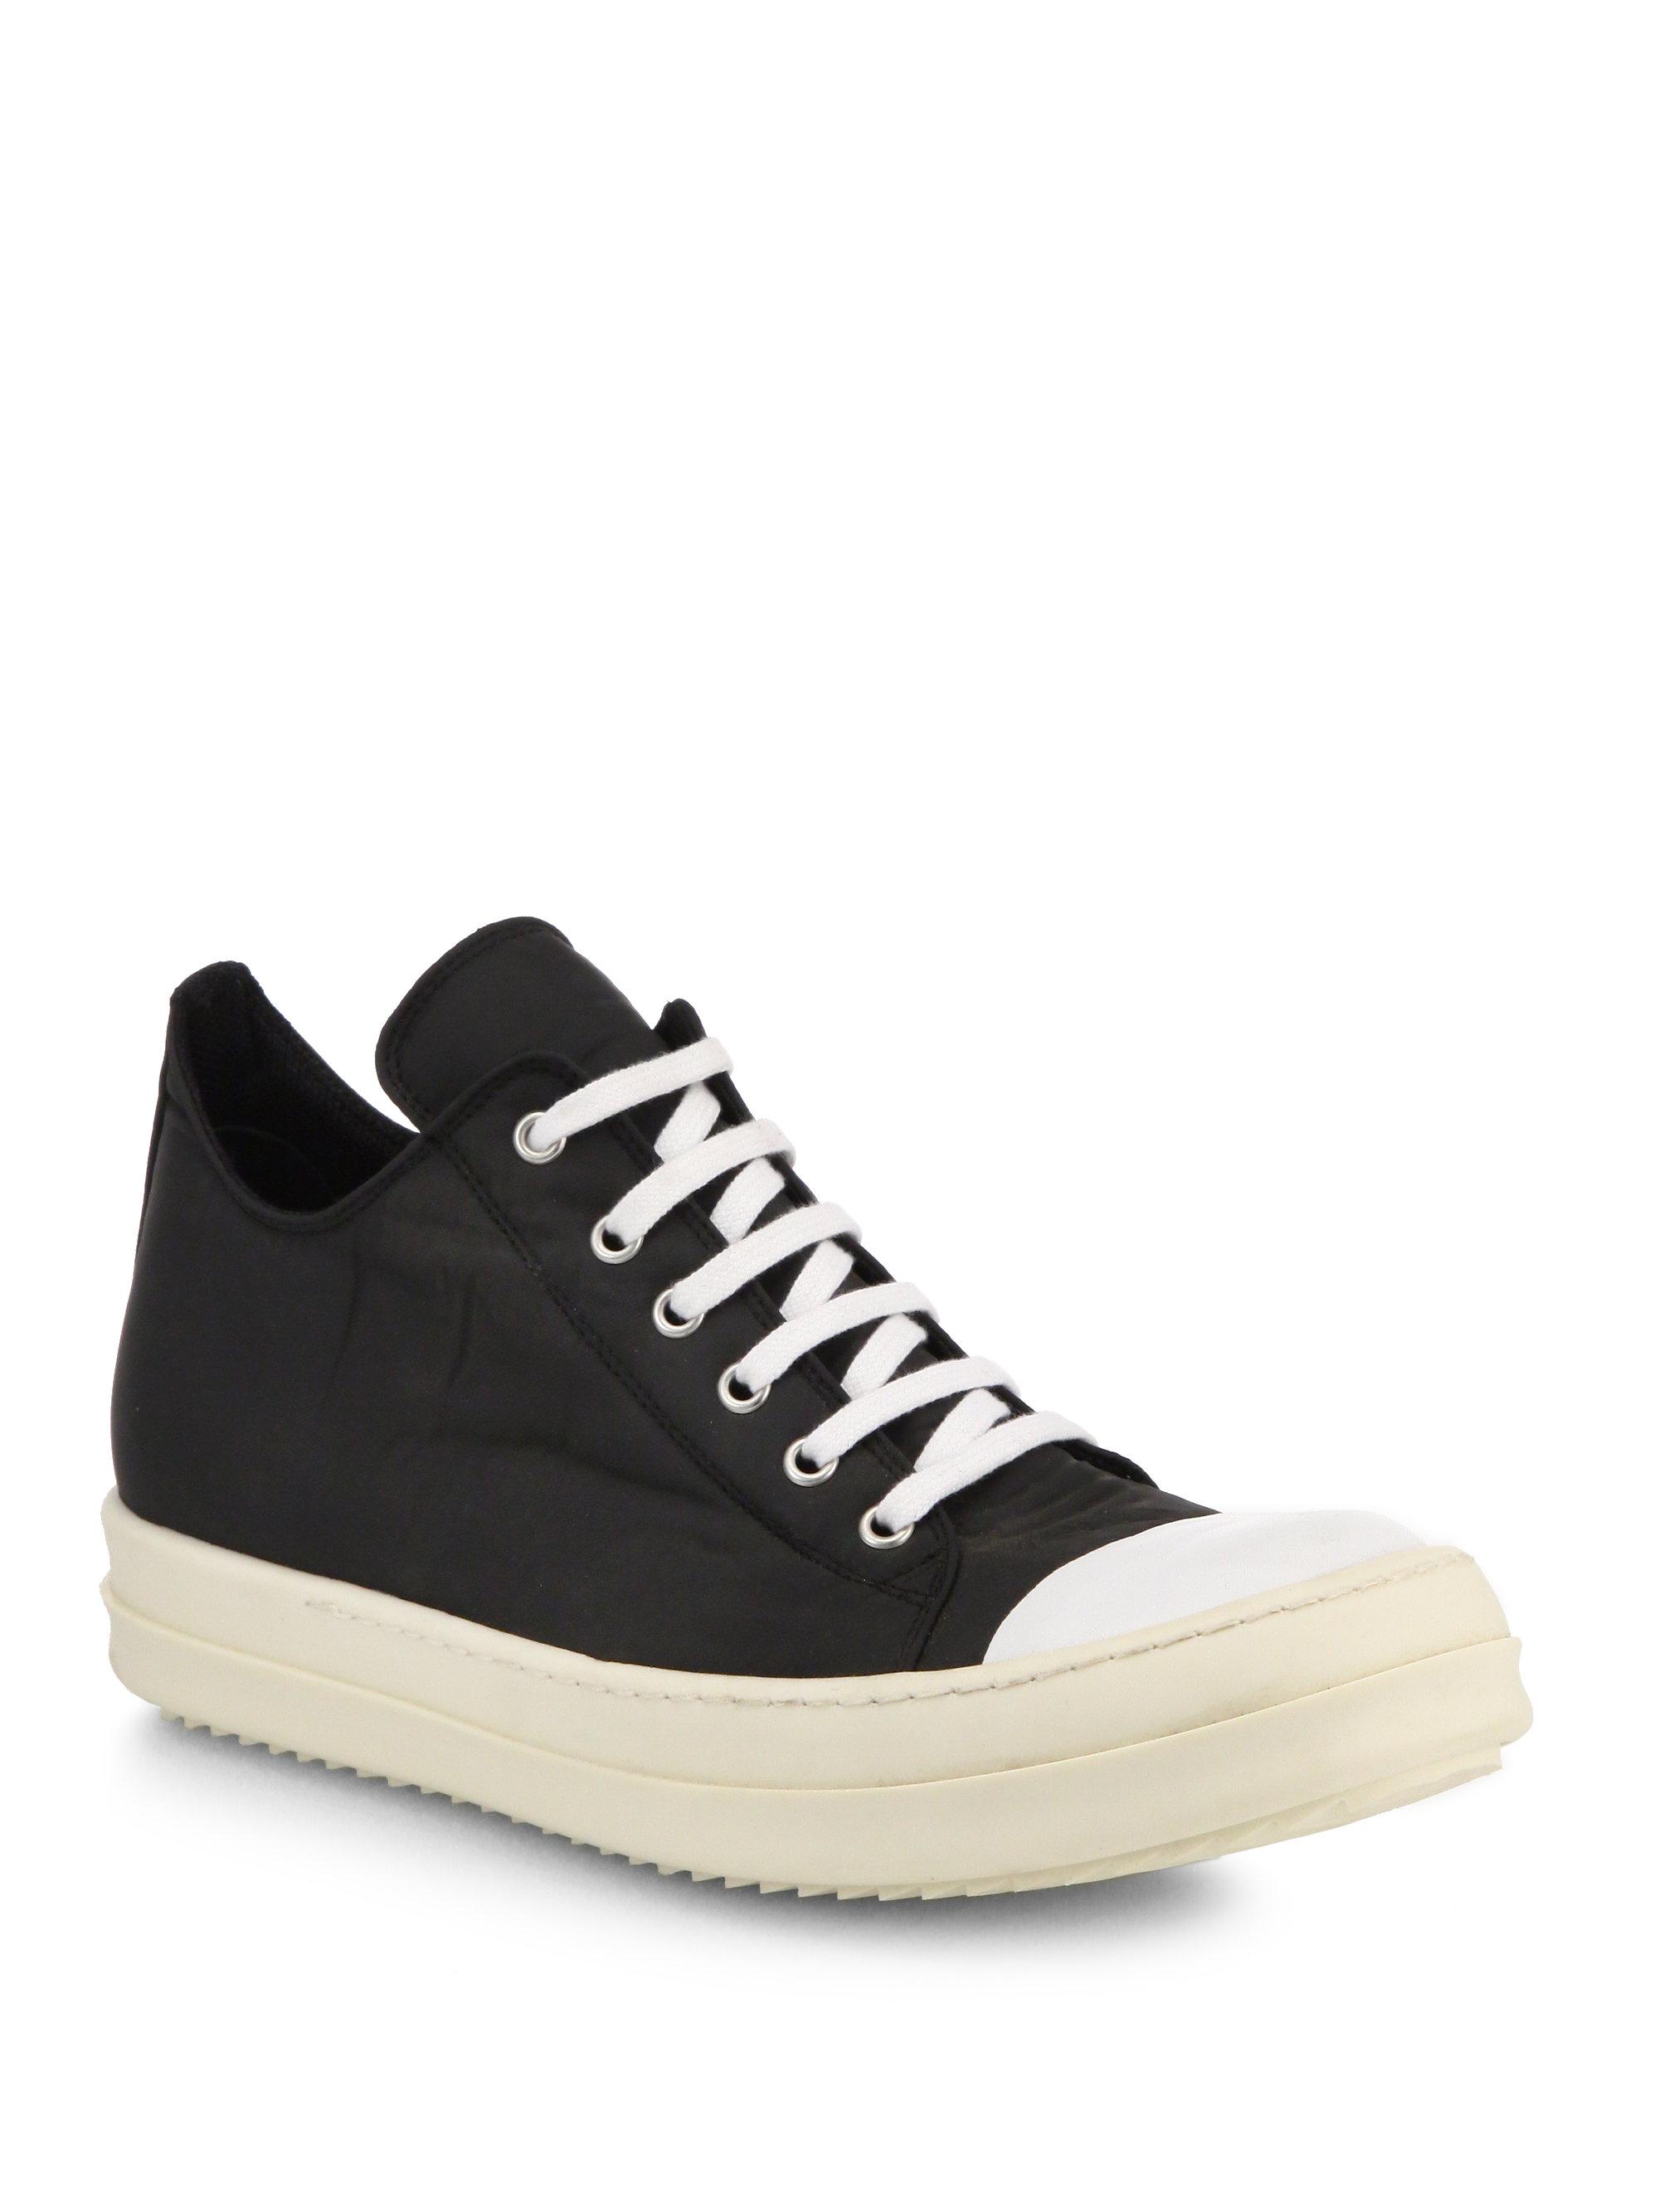 Rick Owens DRKSHDW low top sneakers - Negro Jpa70KSq